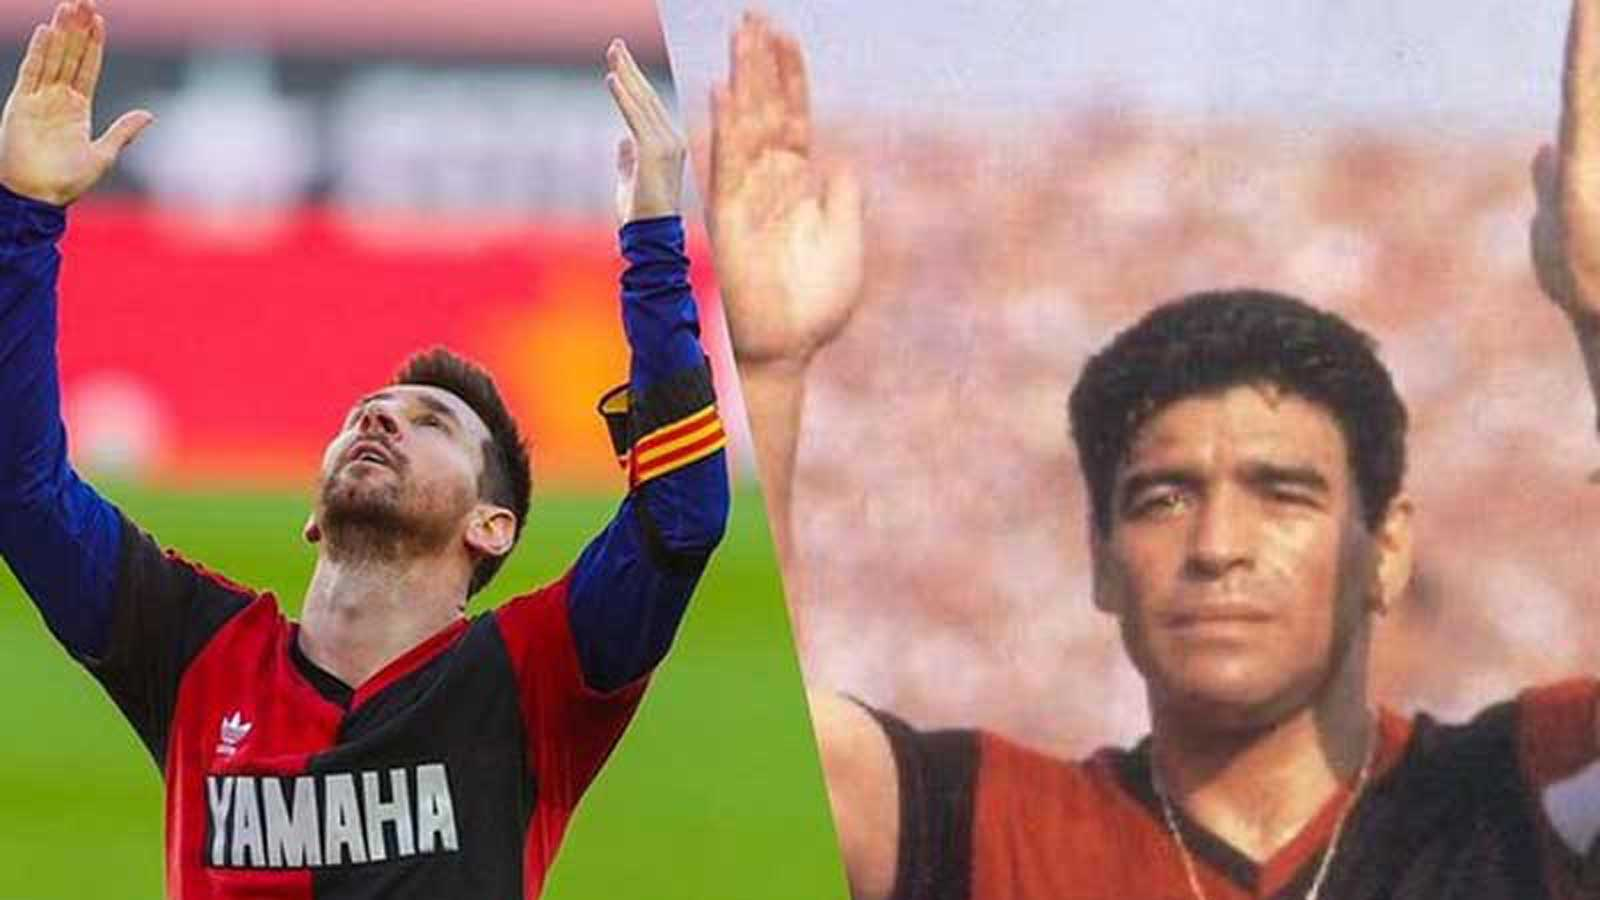 tribute-to-maradona-lionel-messi-fined-600-euros